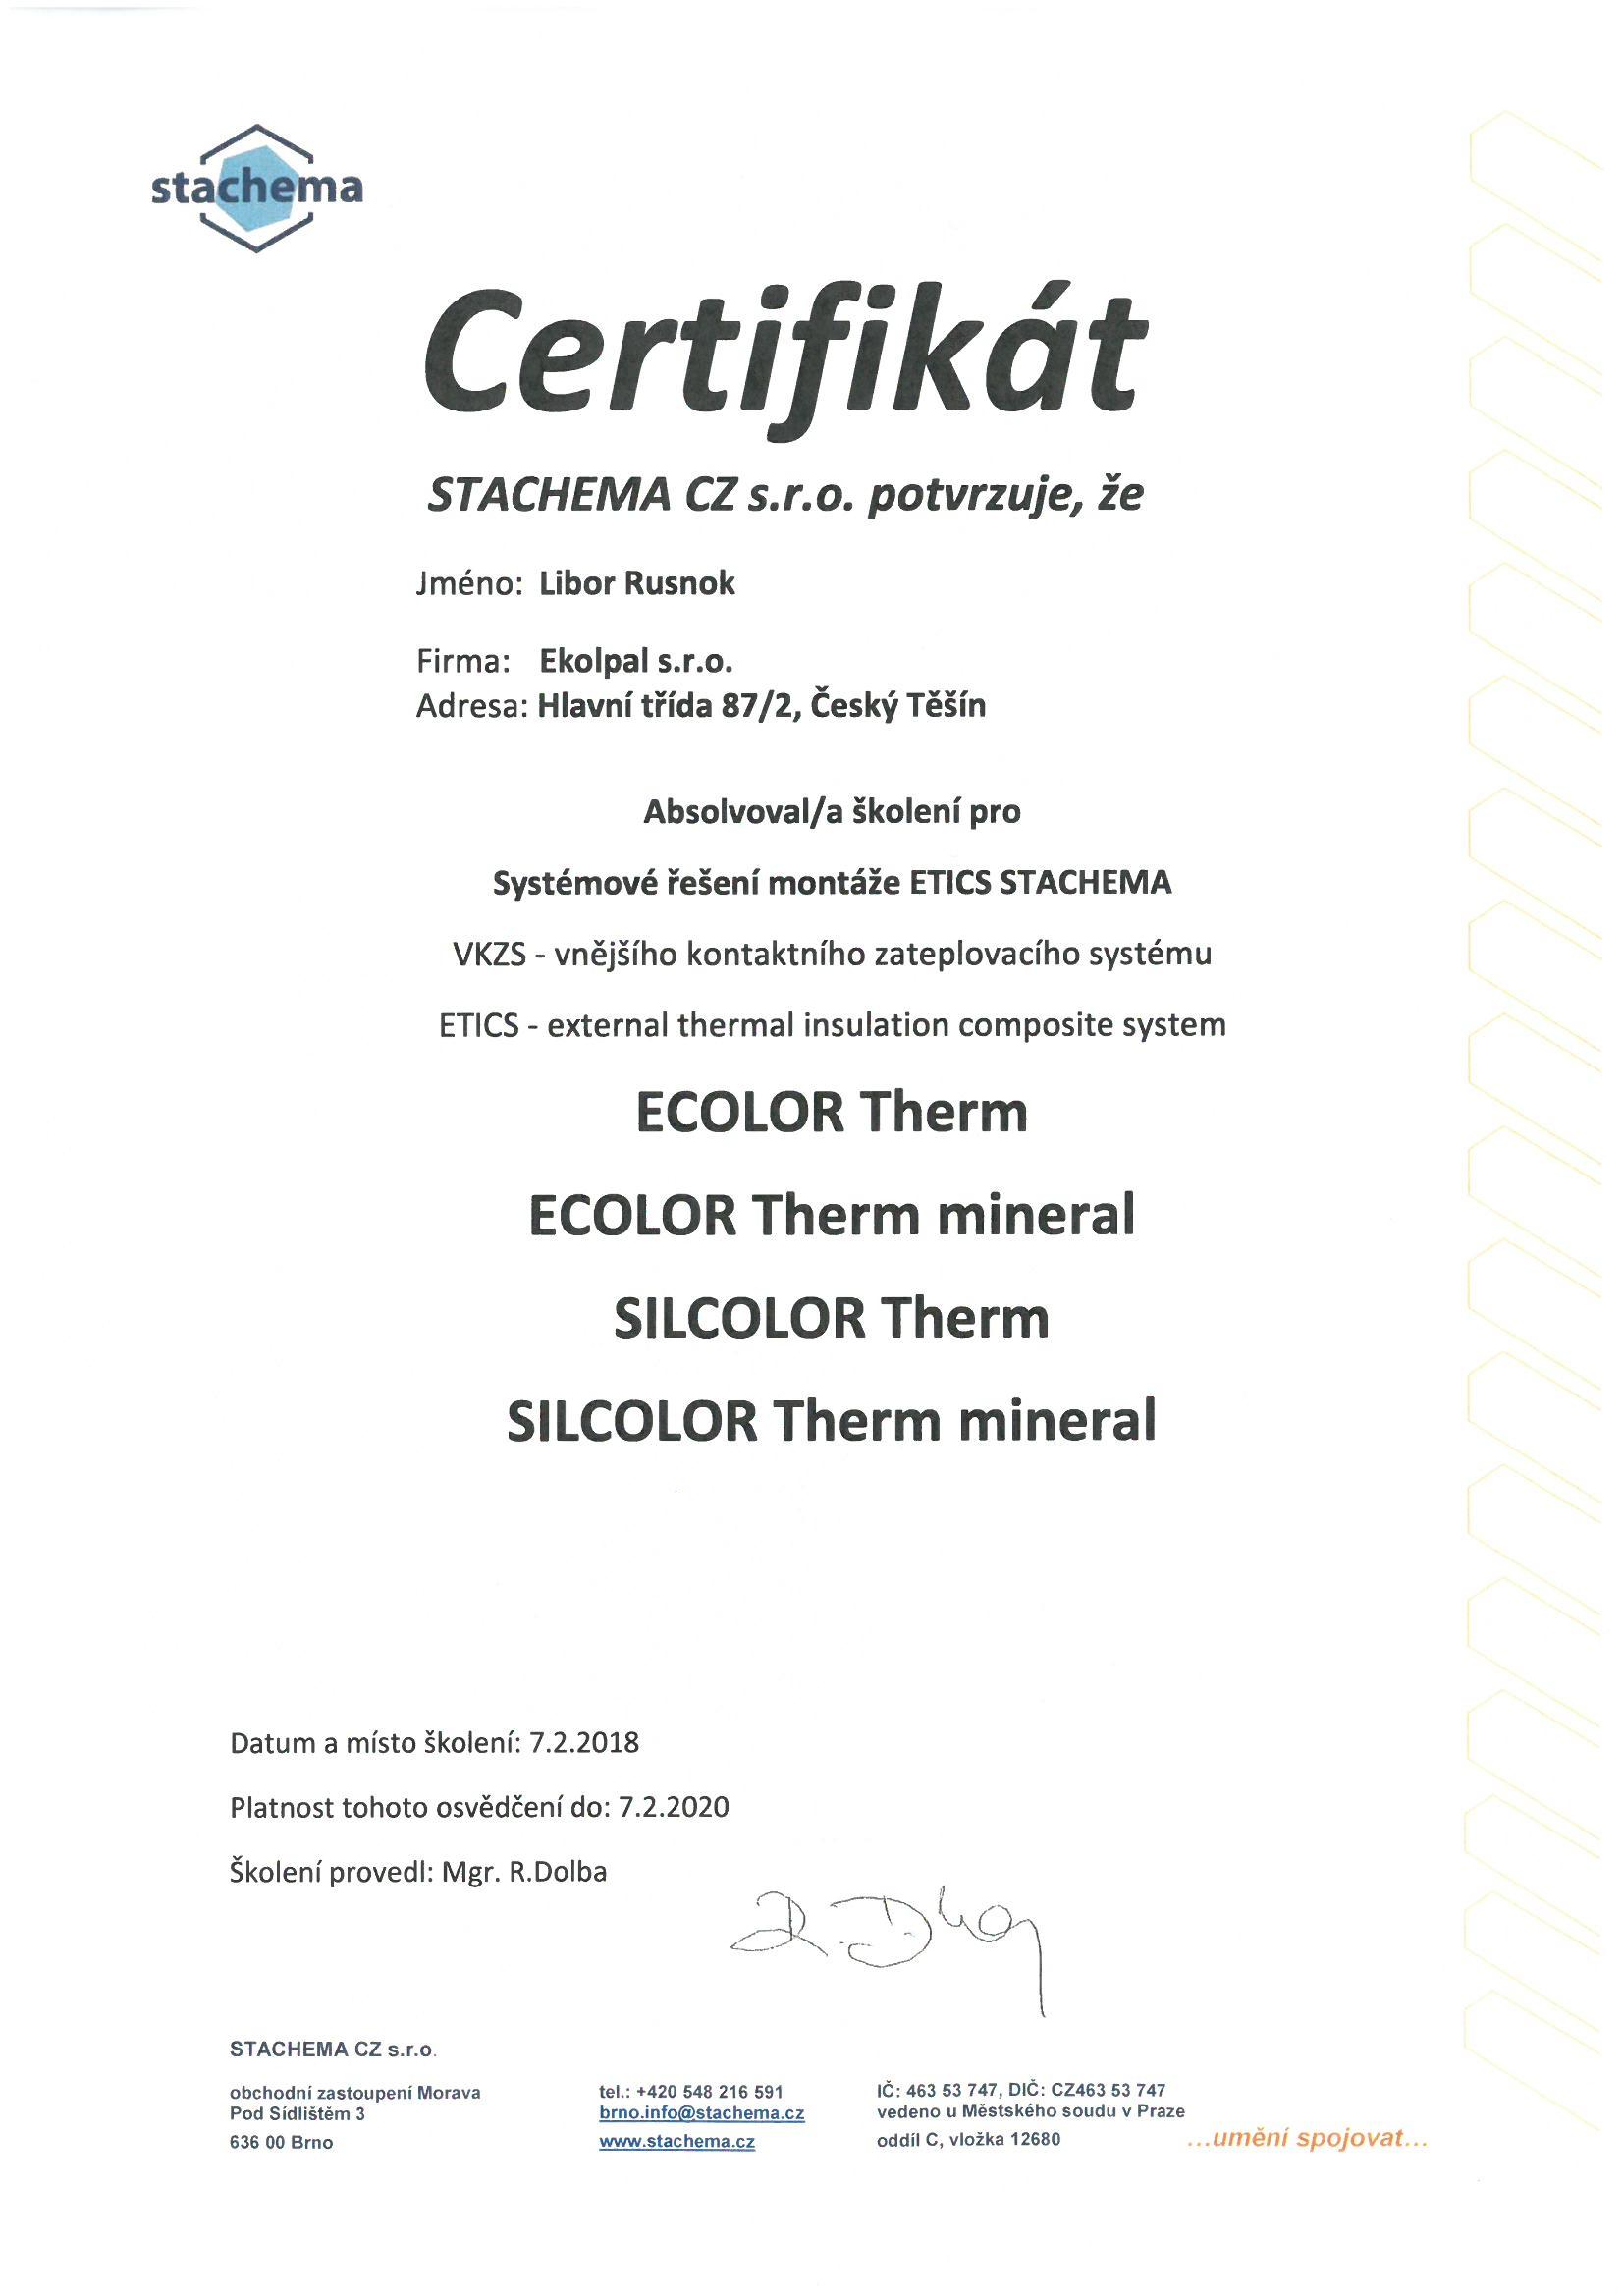 Stachema certifikát